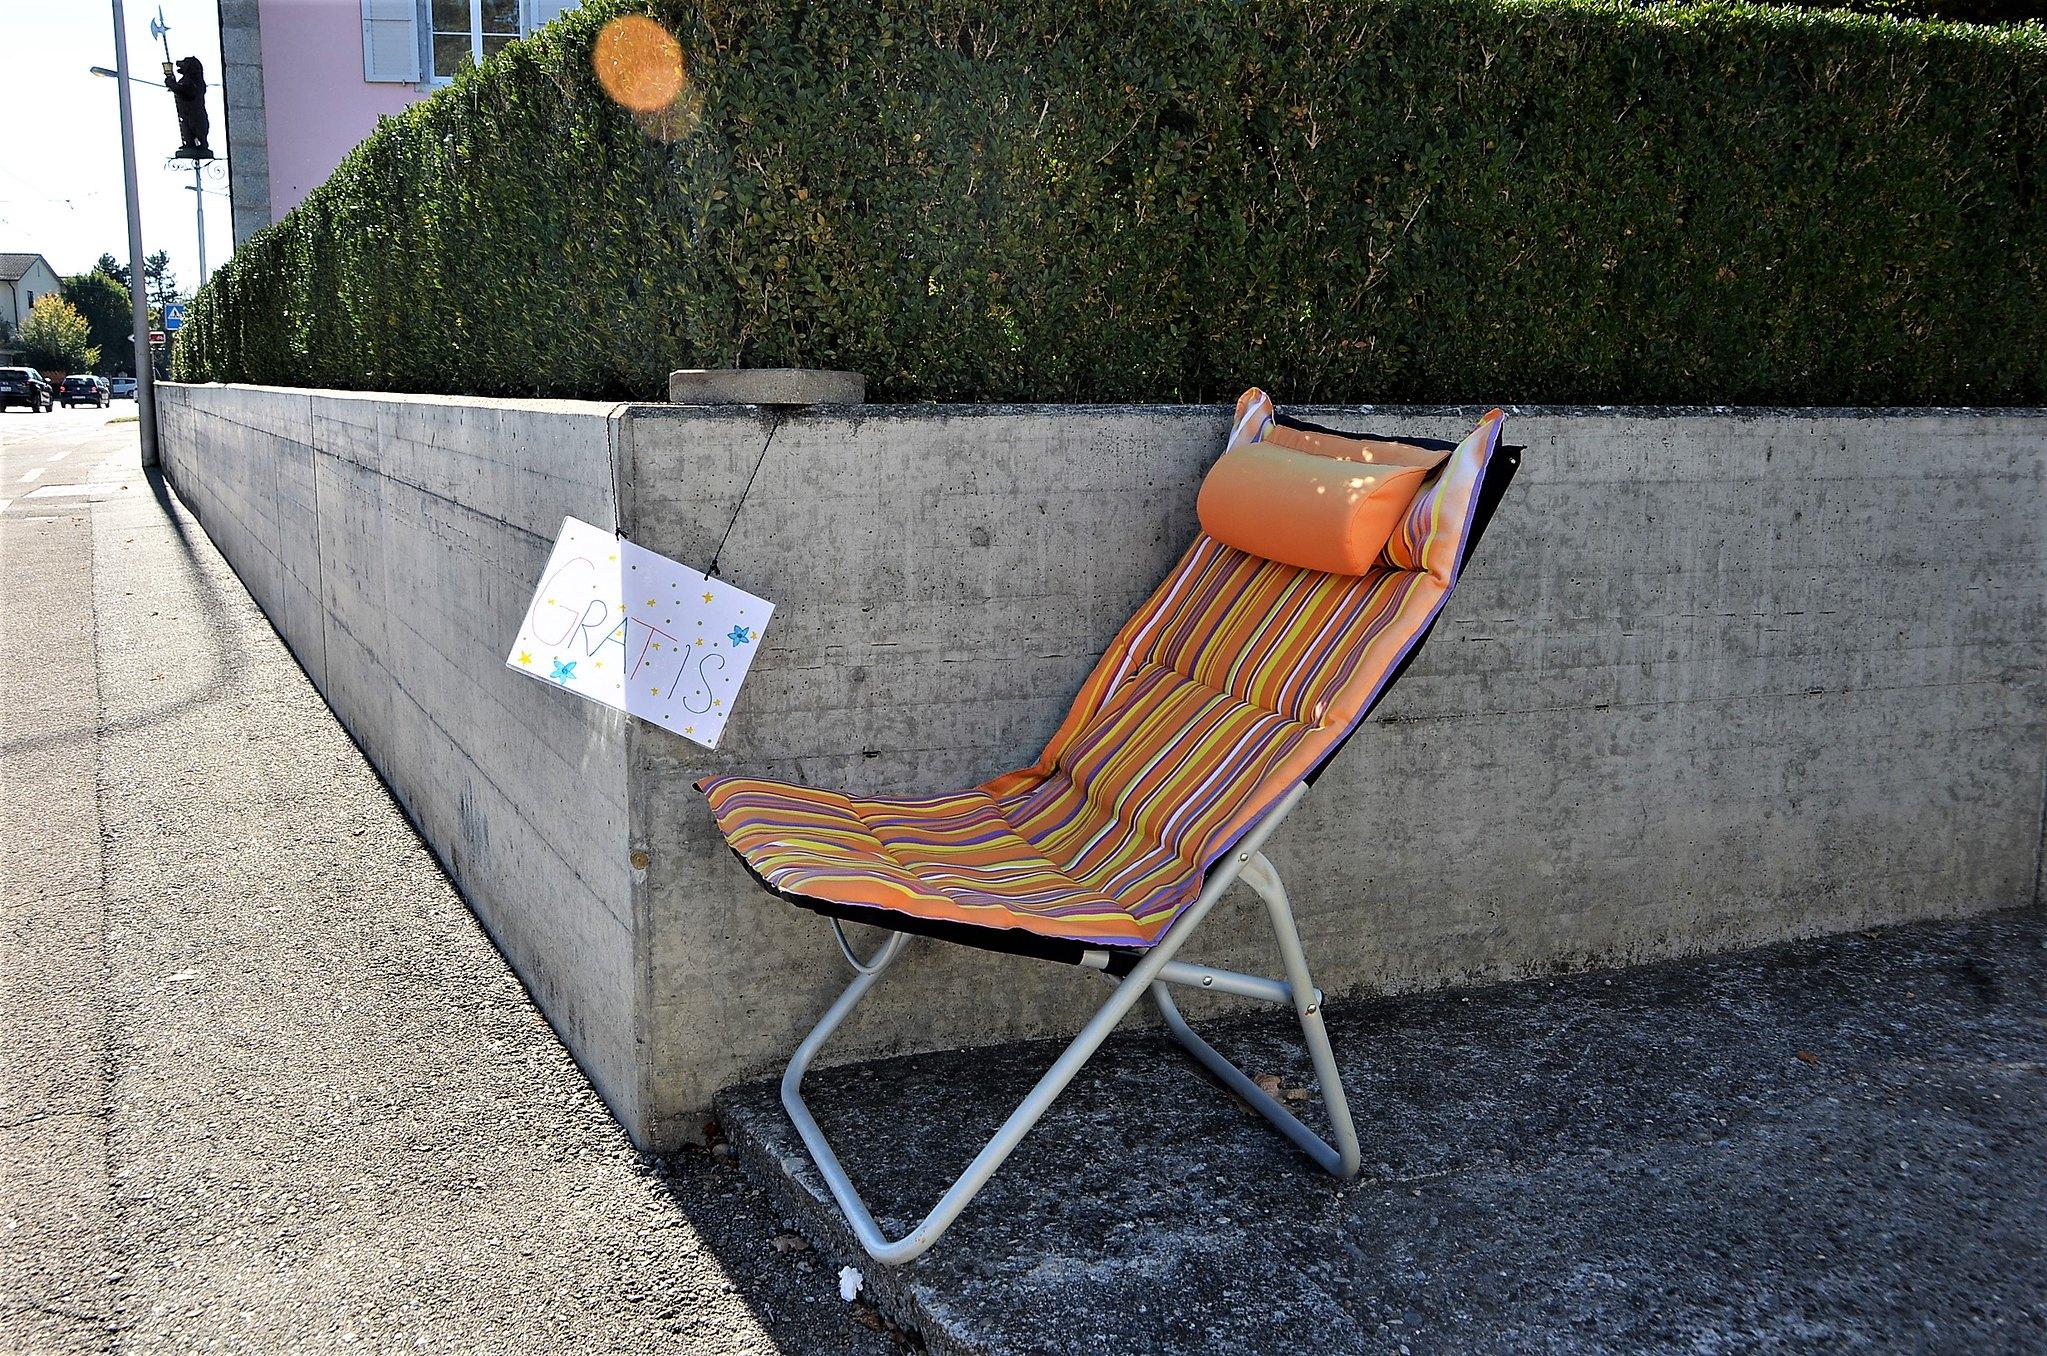 Deckchair Baselstrasse 13.10.2018